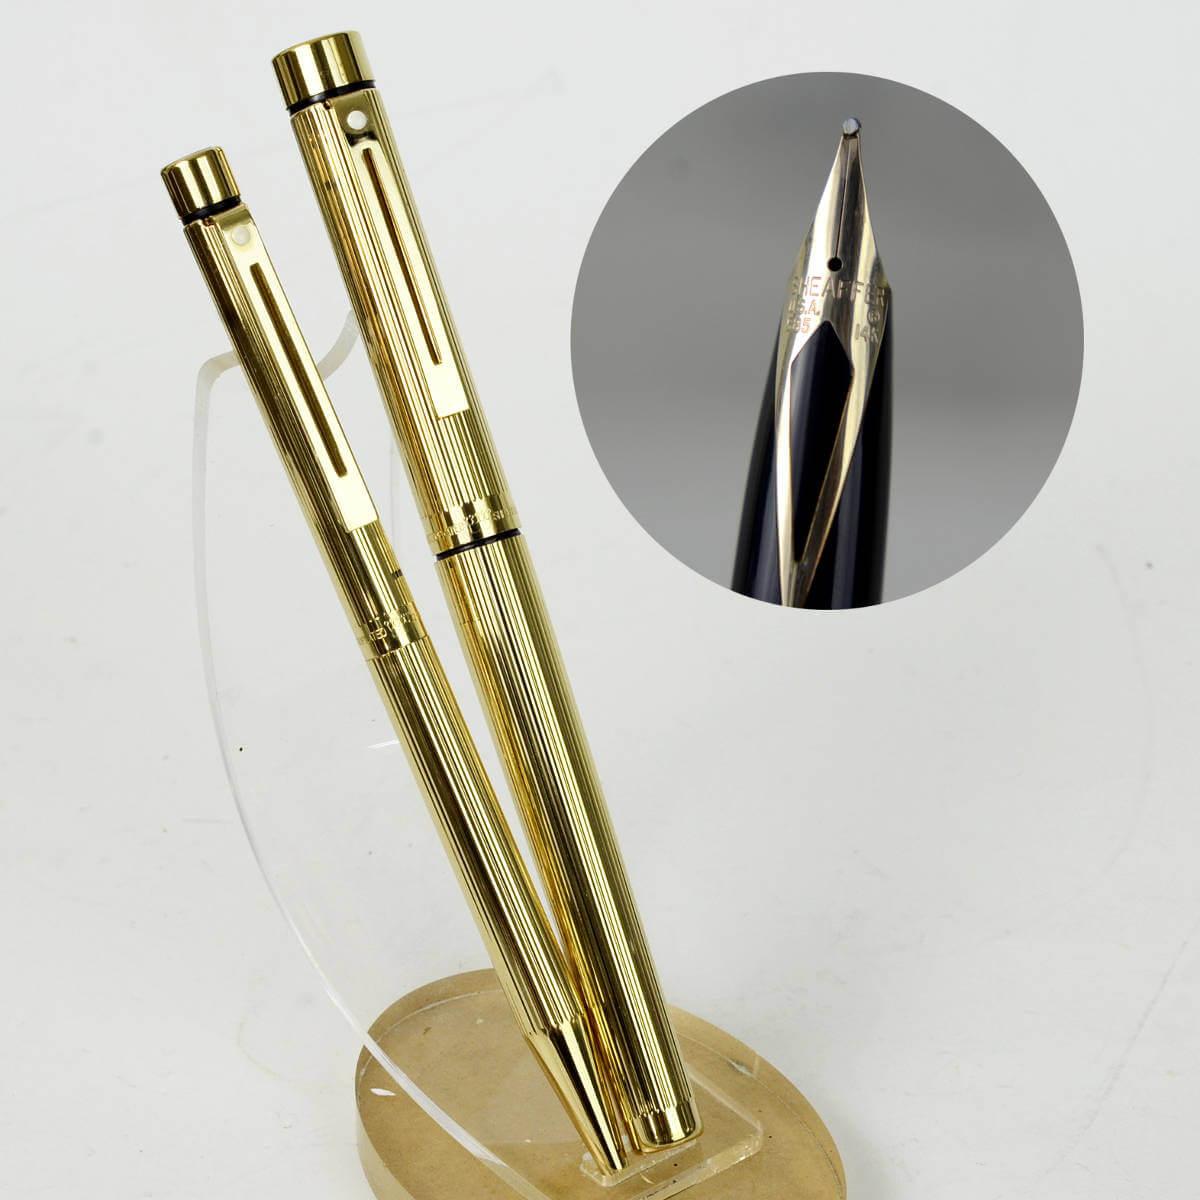 Buy sheaffer targa 1005 set fountain pen and ballpoint with 14k gold b nib